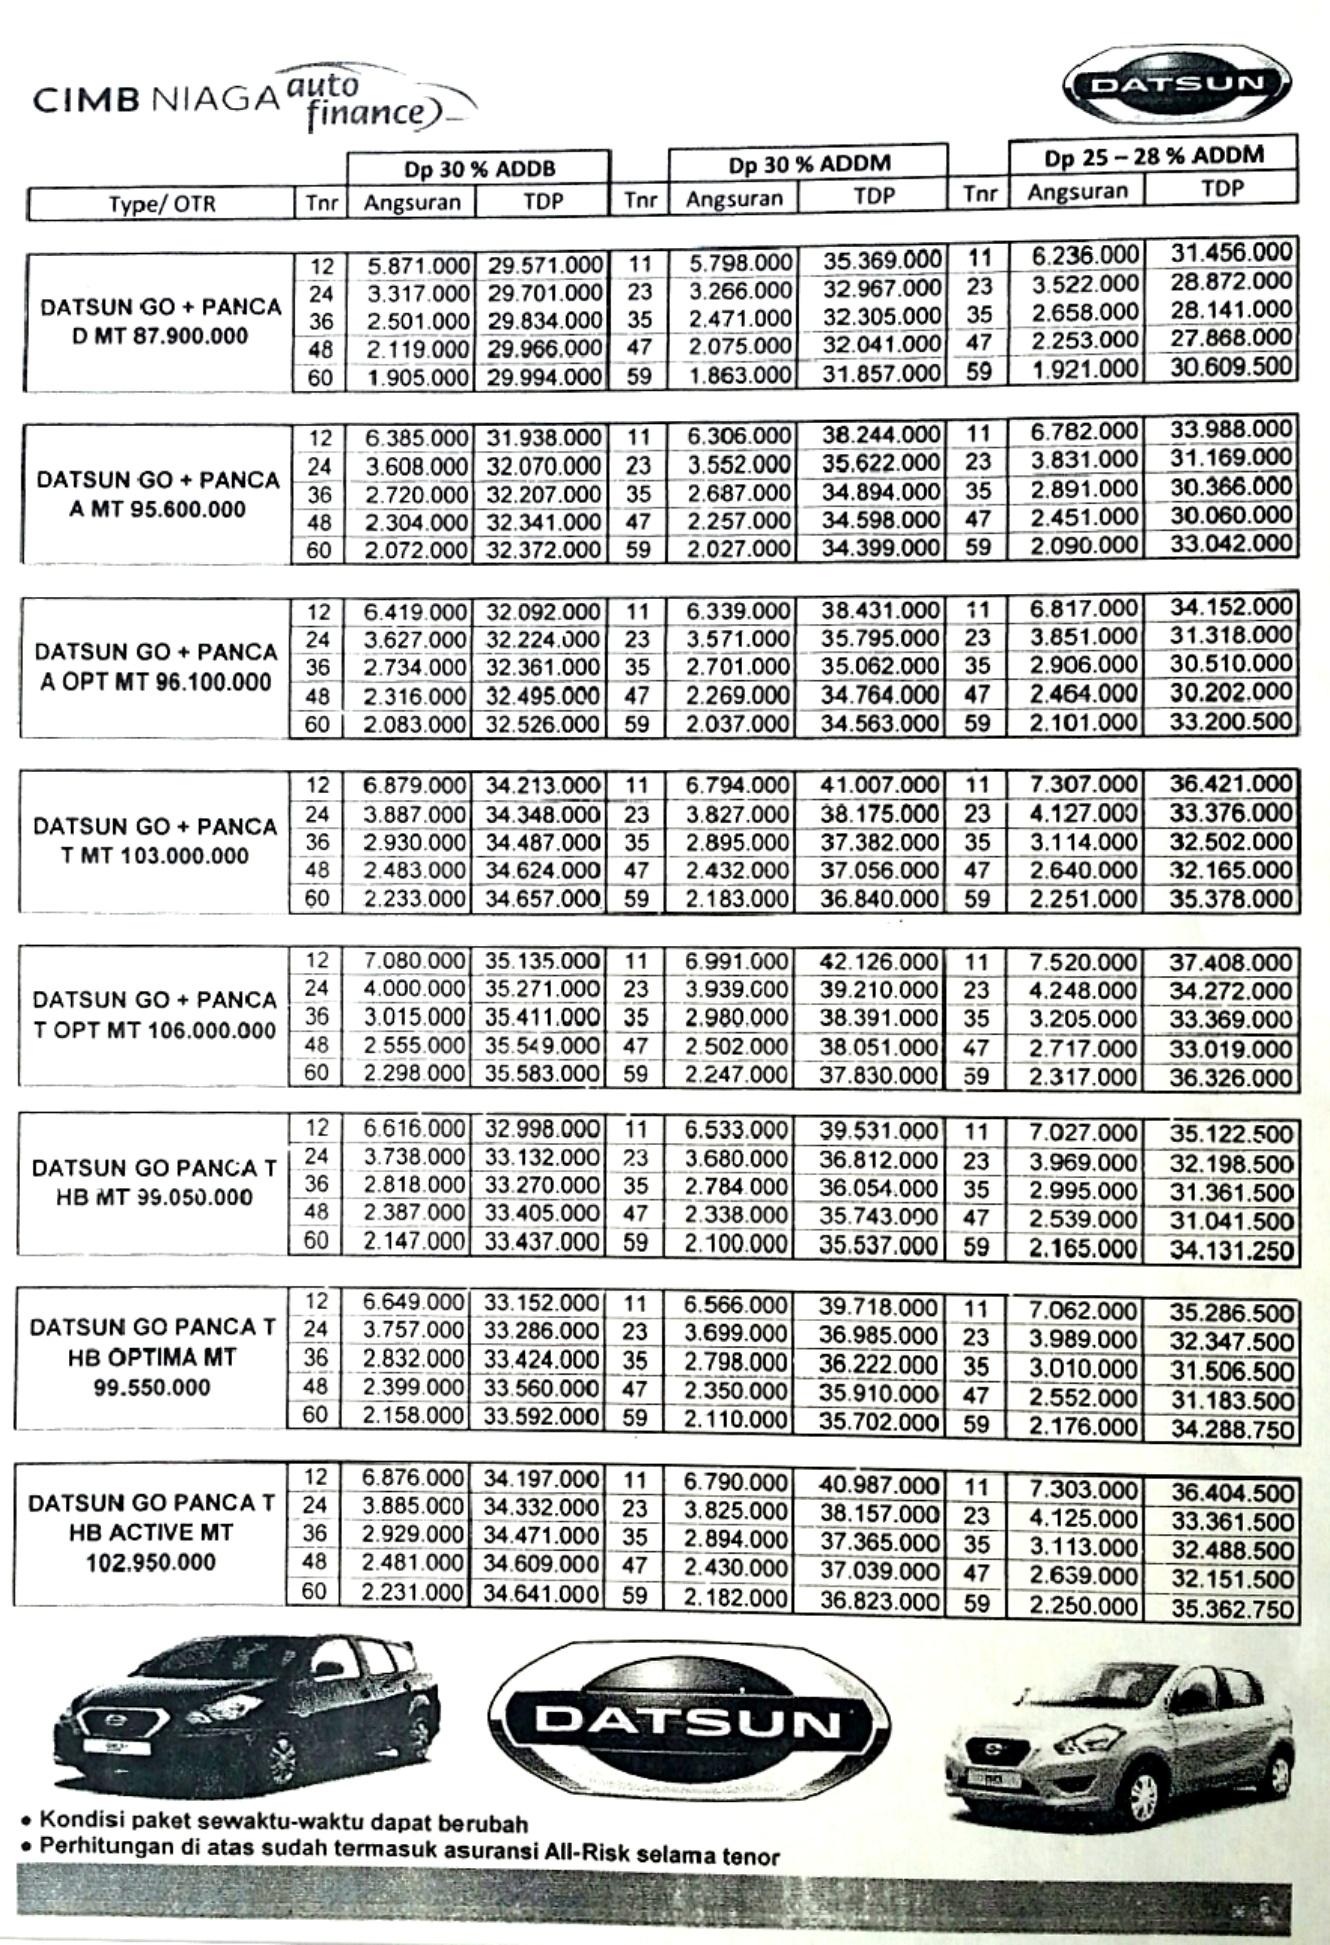 Info Harga Dan Spesifikasi Datsun Go Review Mobil Info ...